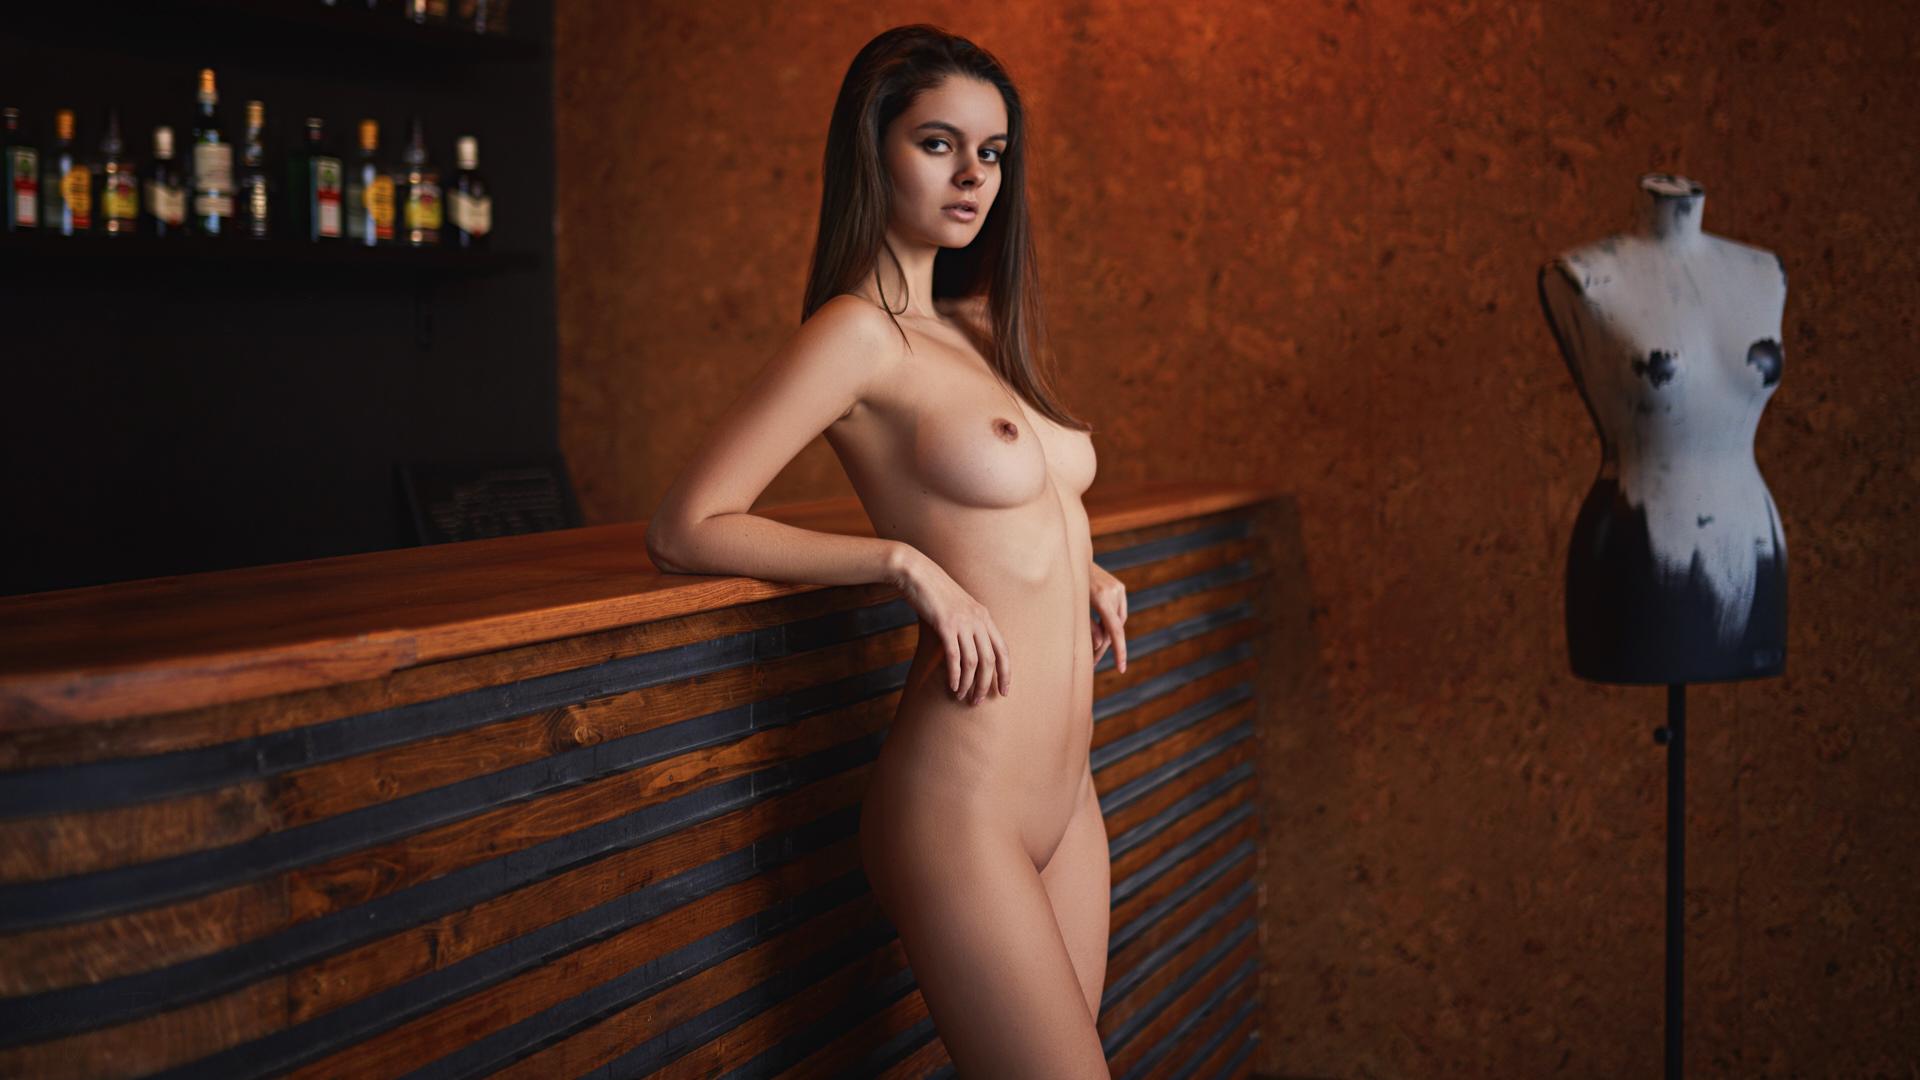 Jennifer lawrence nude the fappening leaked photos enhanced